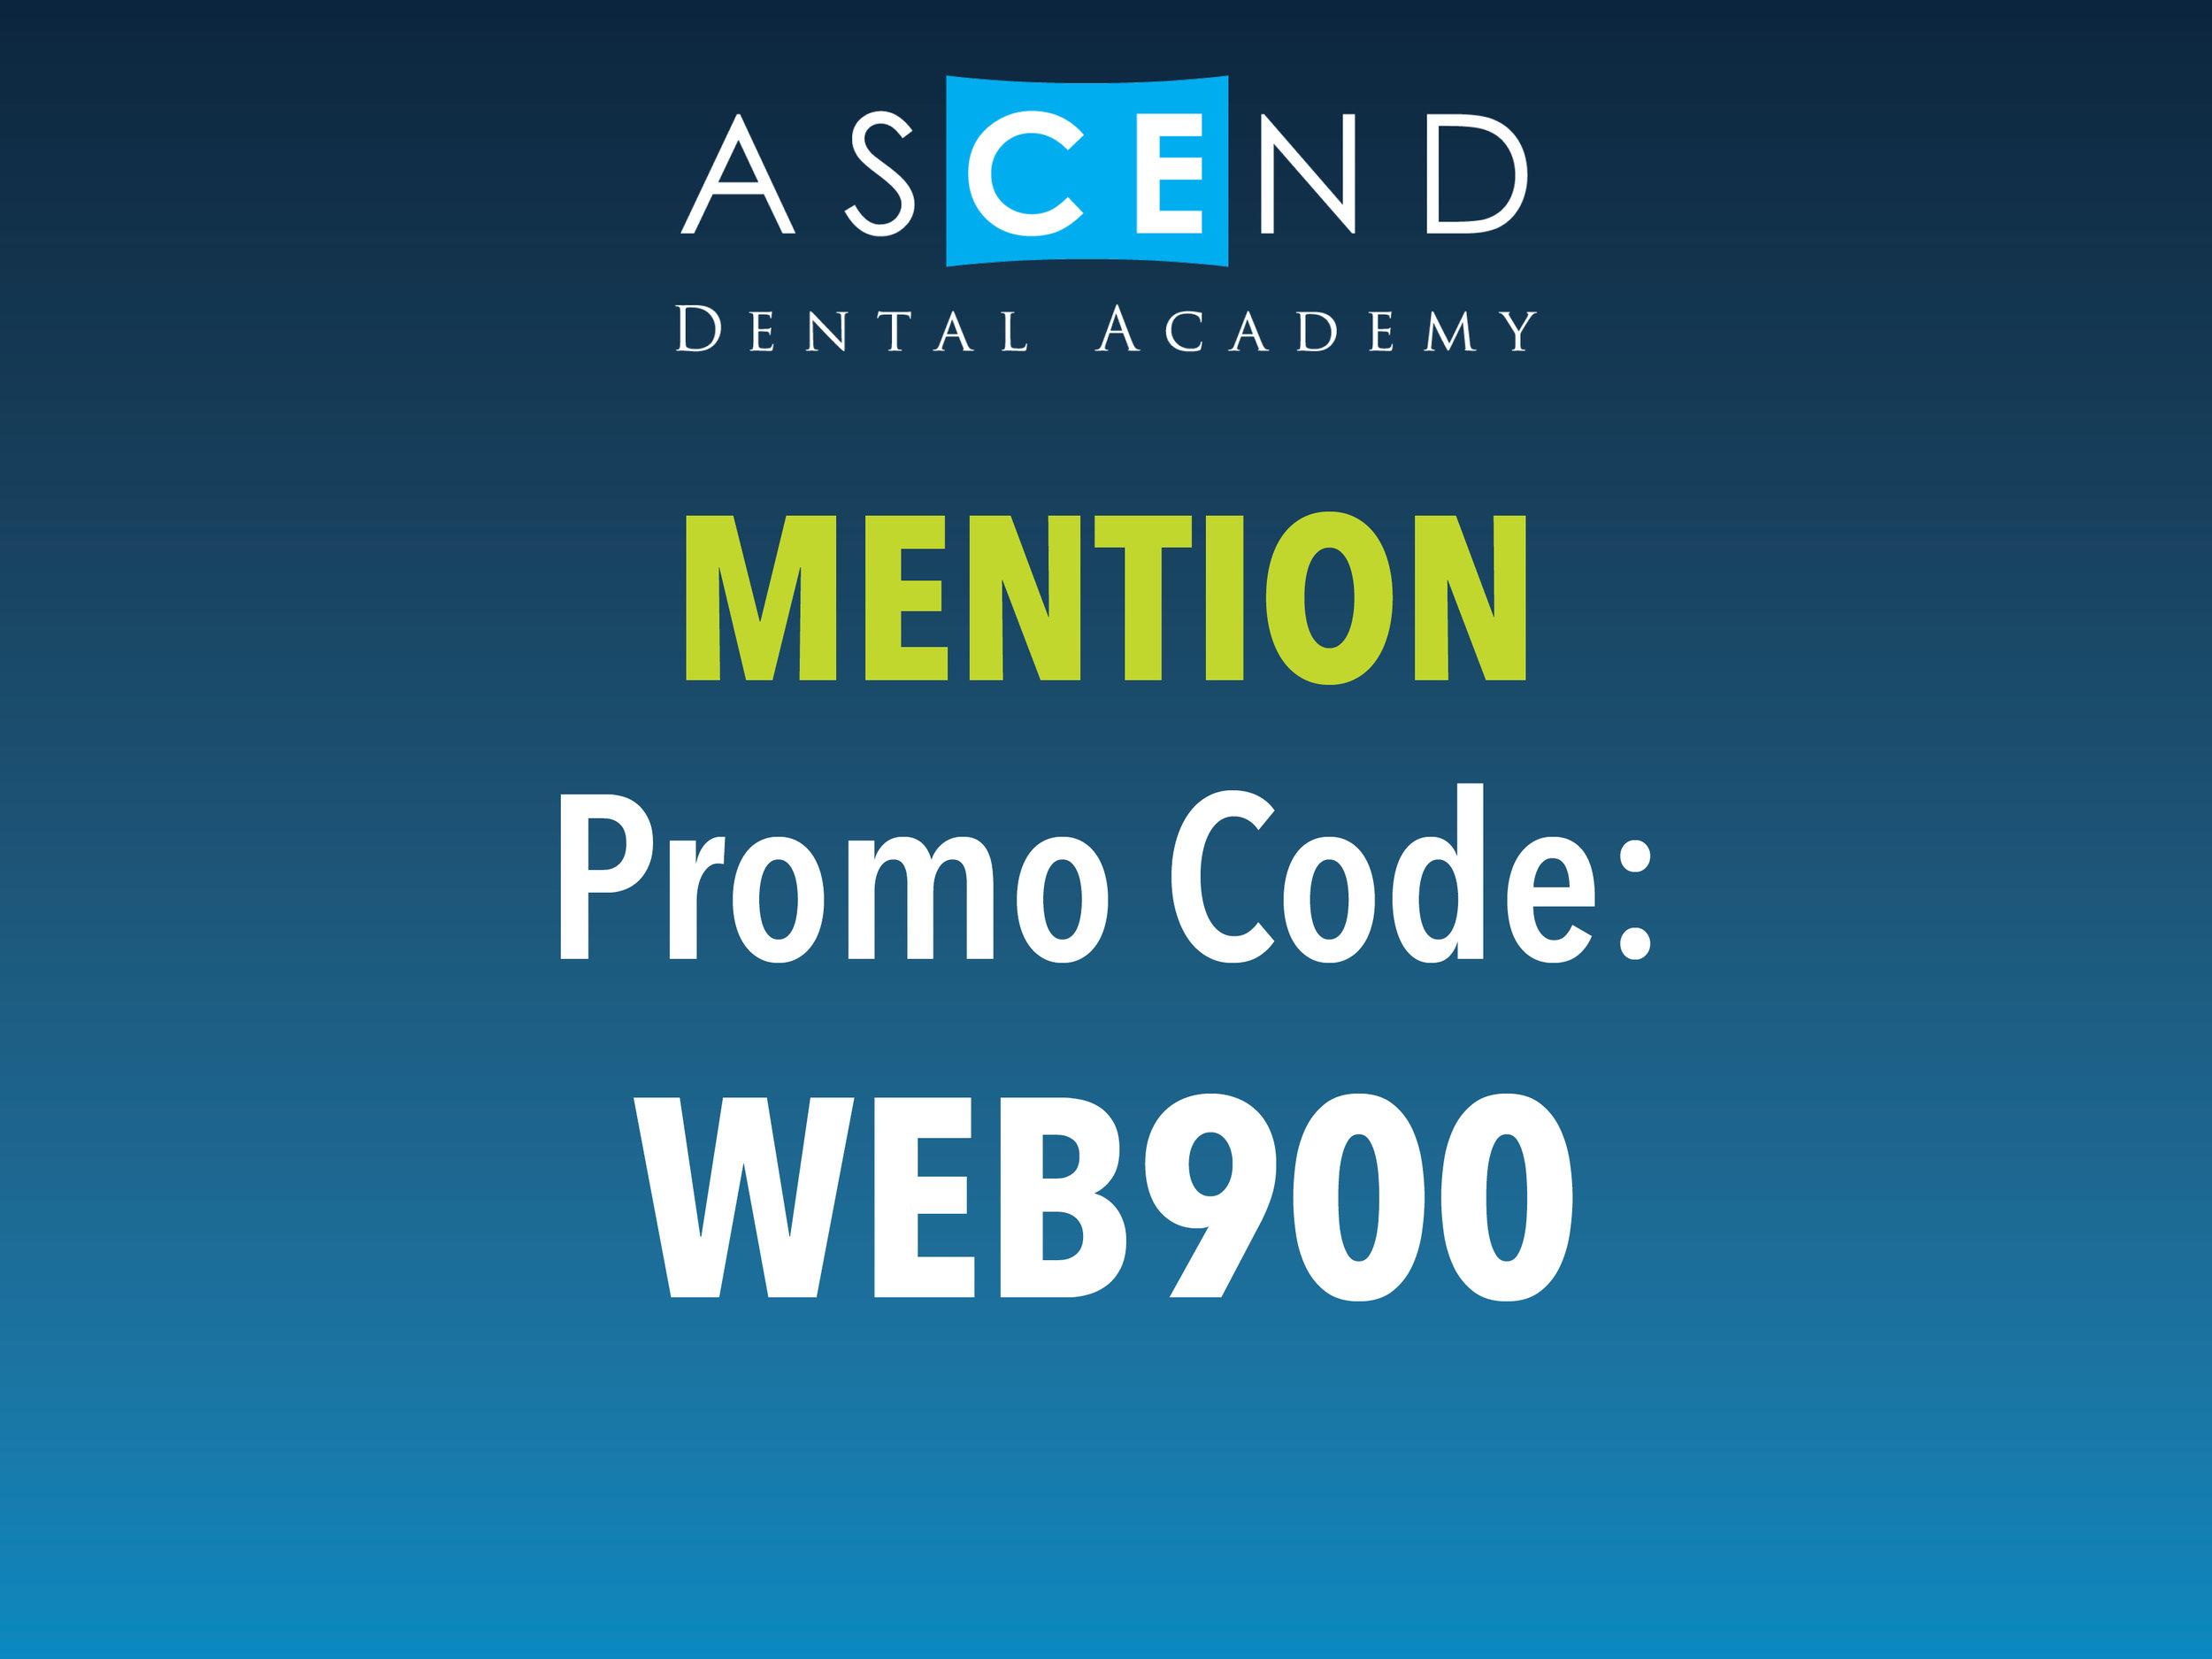 webpromocode1.jpg